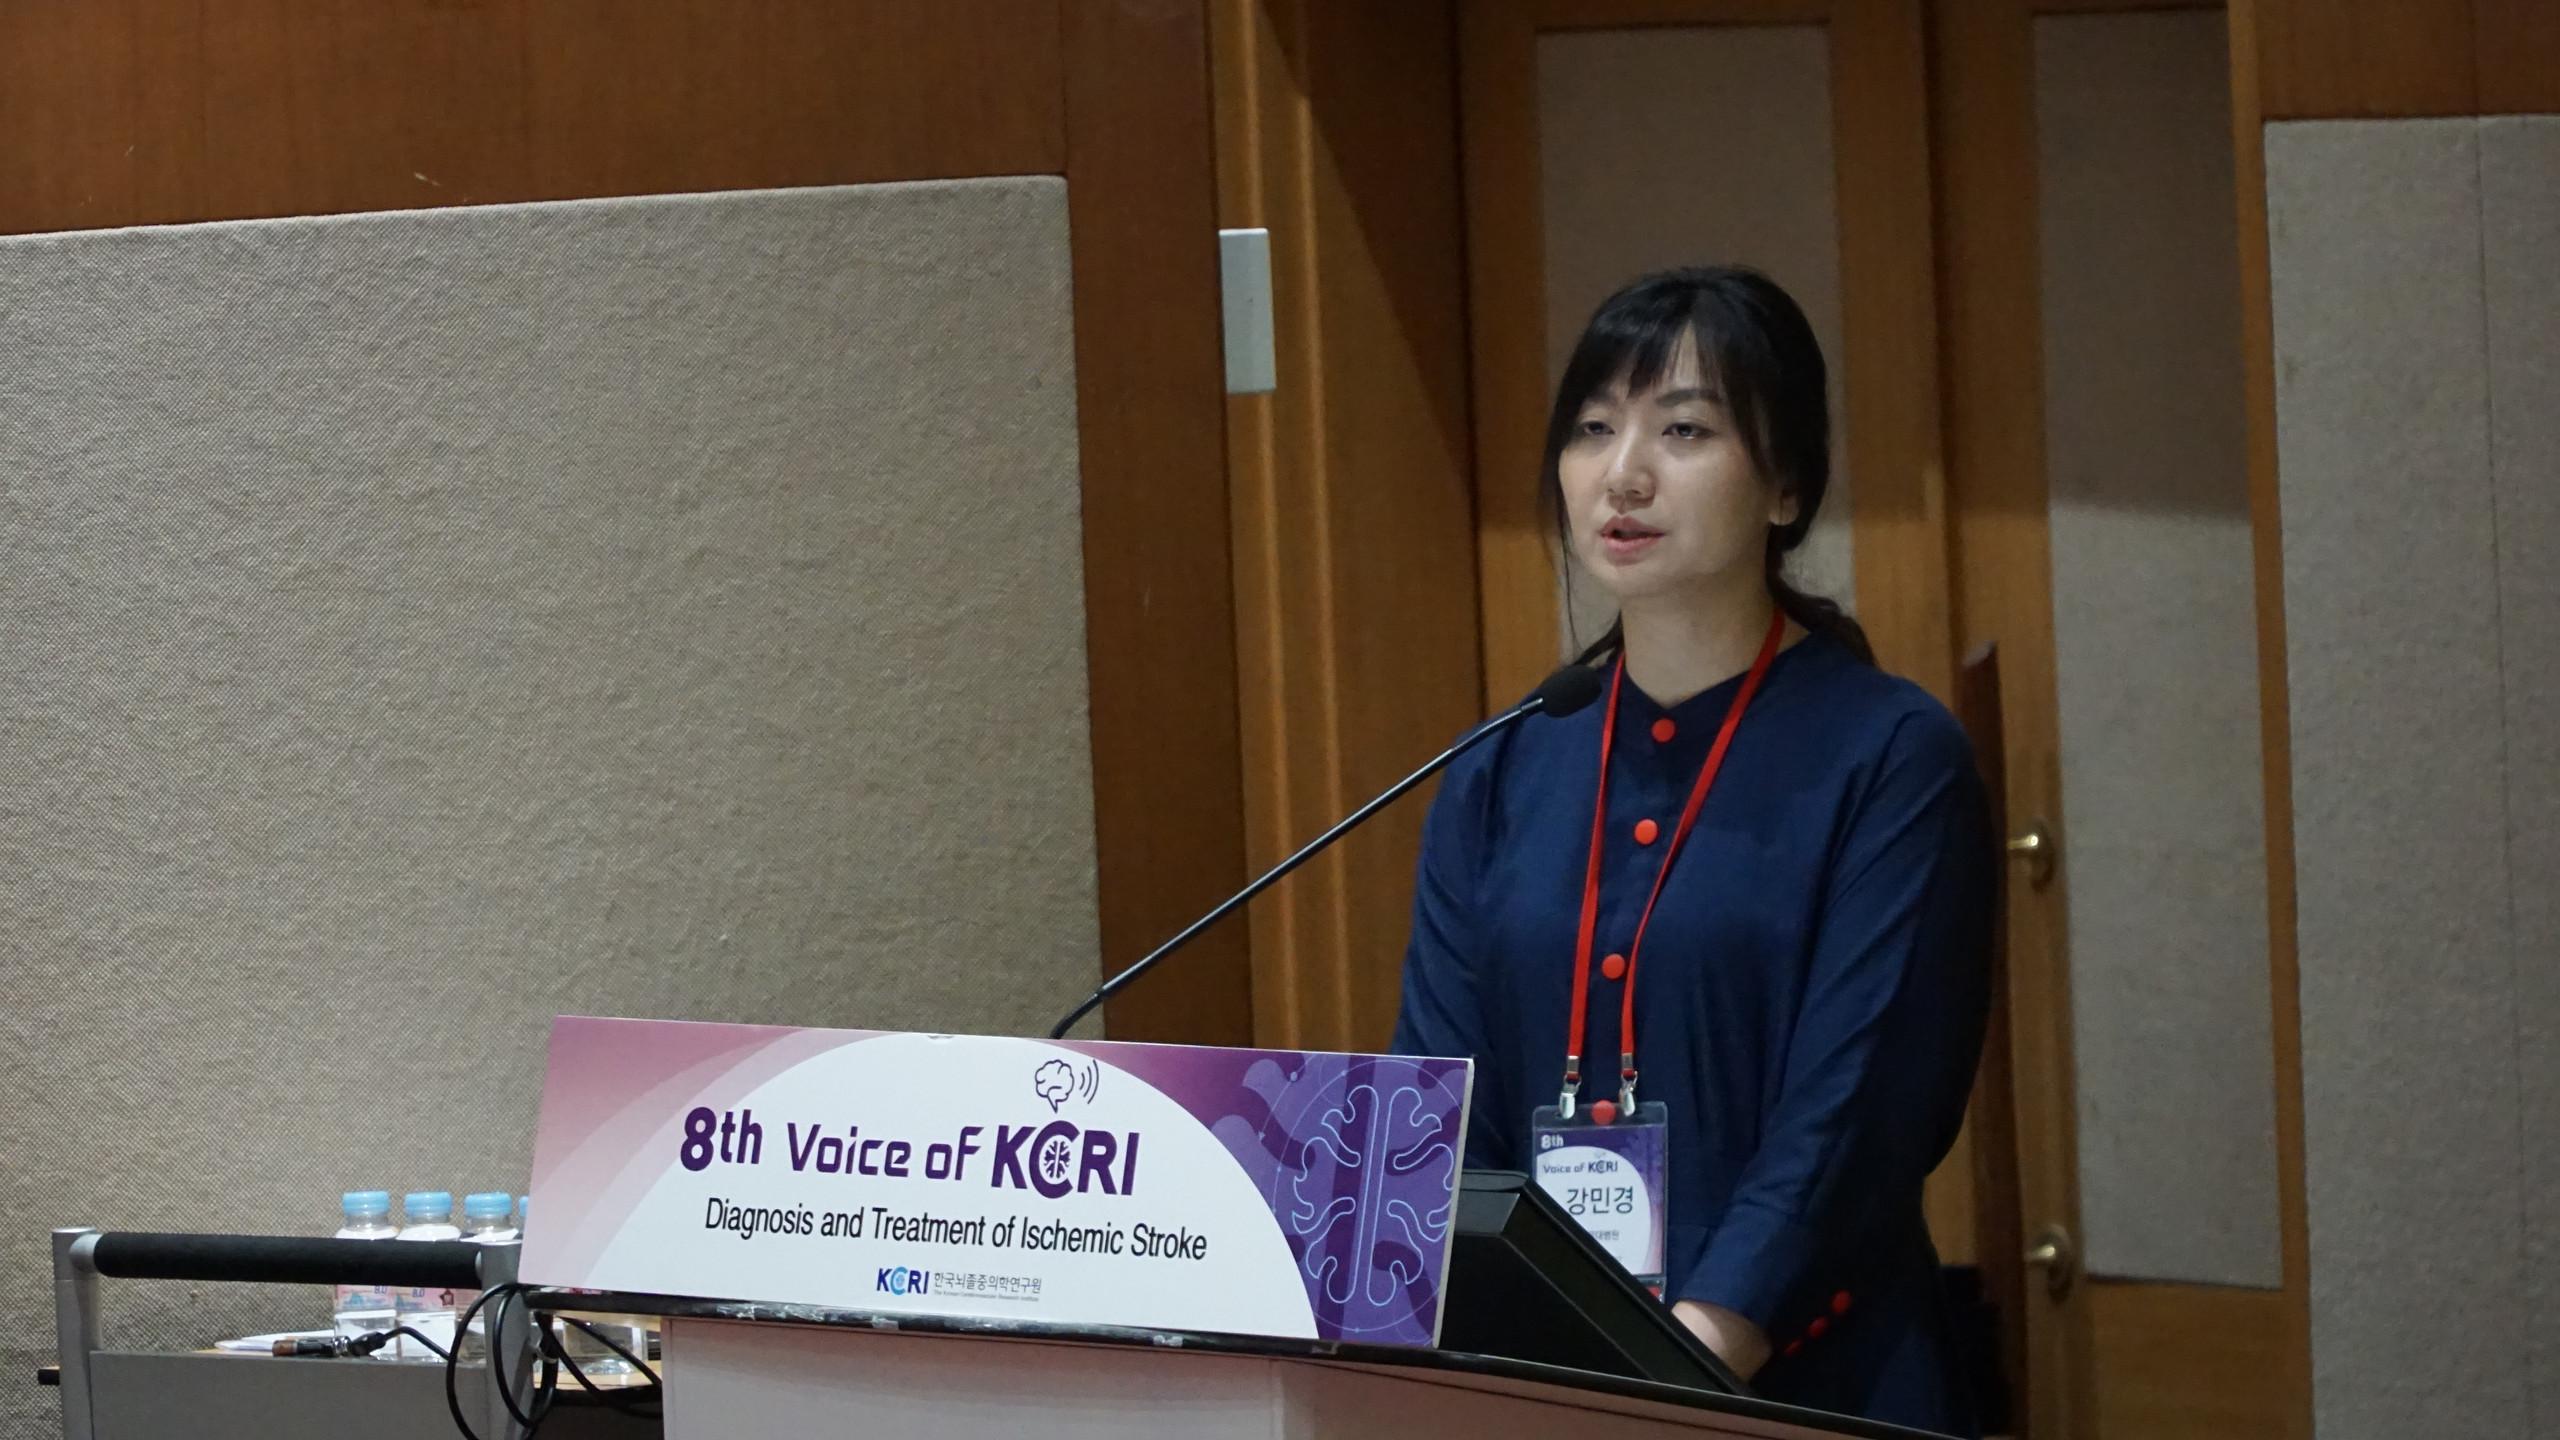 8th Voice of KCRI_10